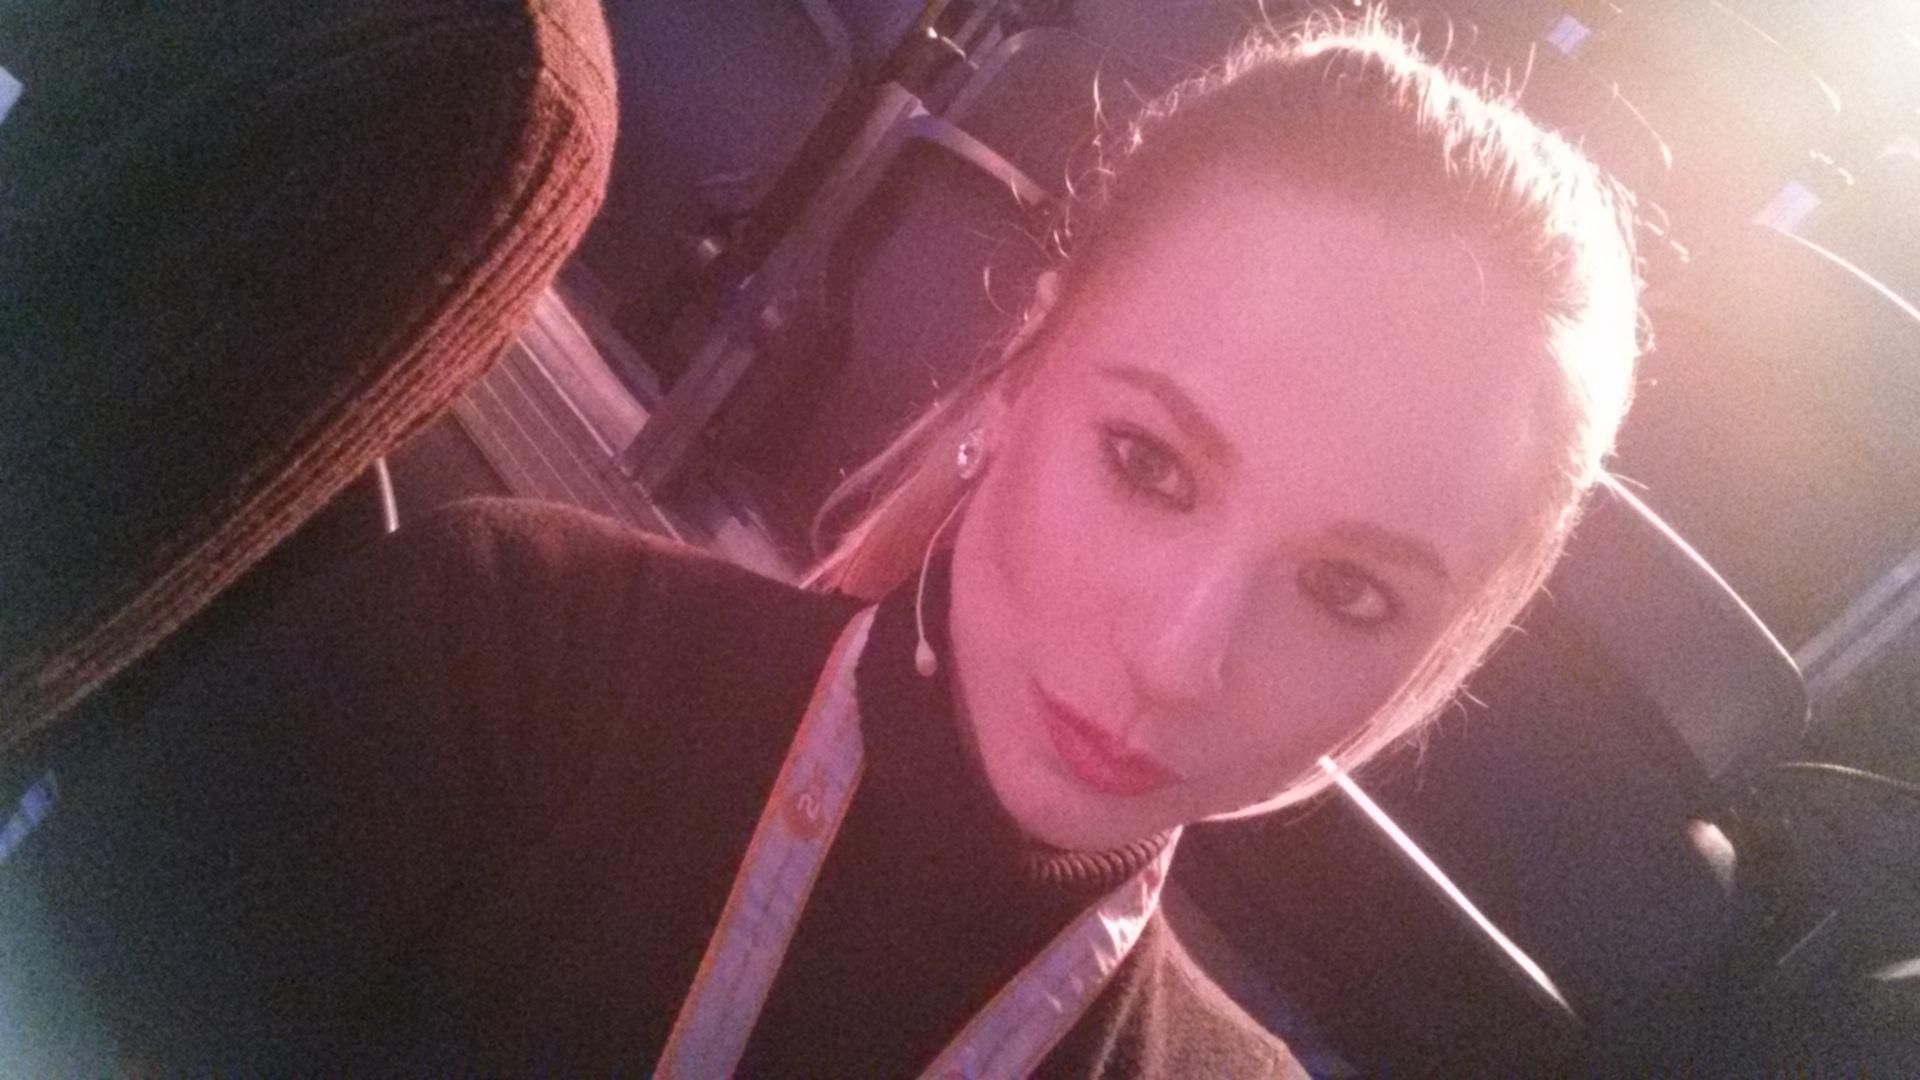 Sandra_Specht_Moderatorin_Model_TV_Germany (2)